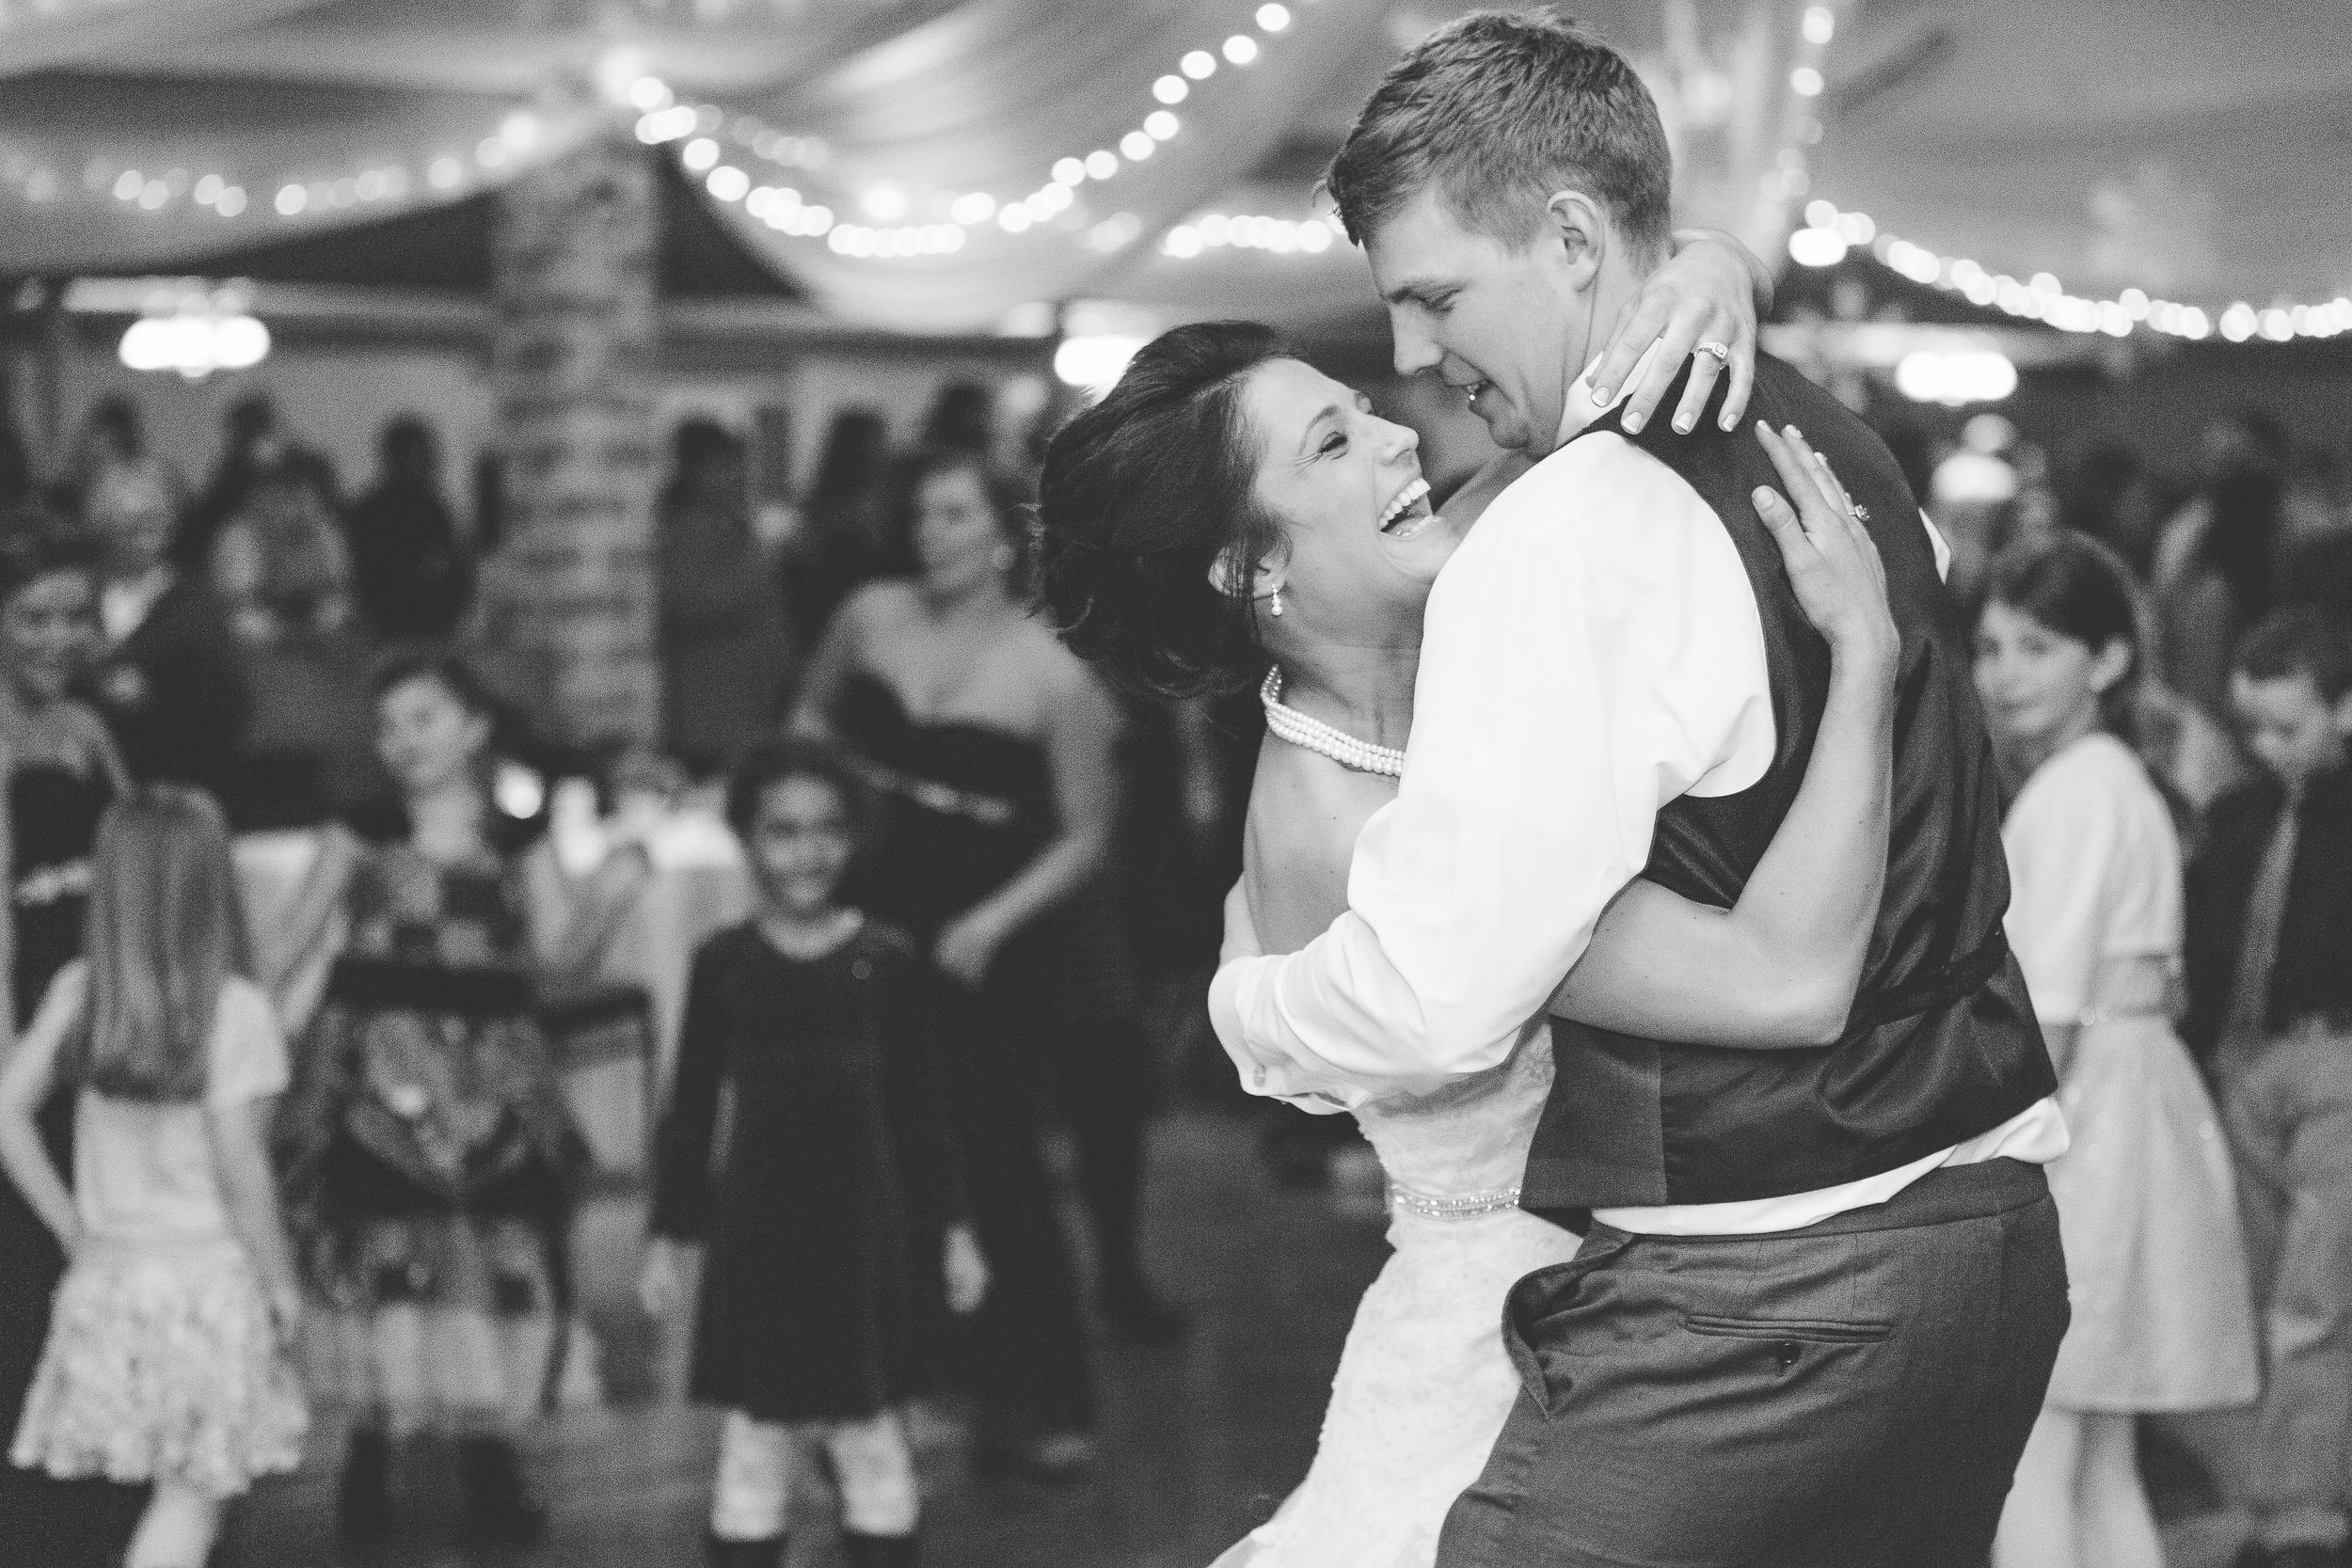 #brideandgroom #mnwedding #winterwedding #mnweddingphotographer #firstdance